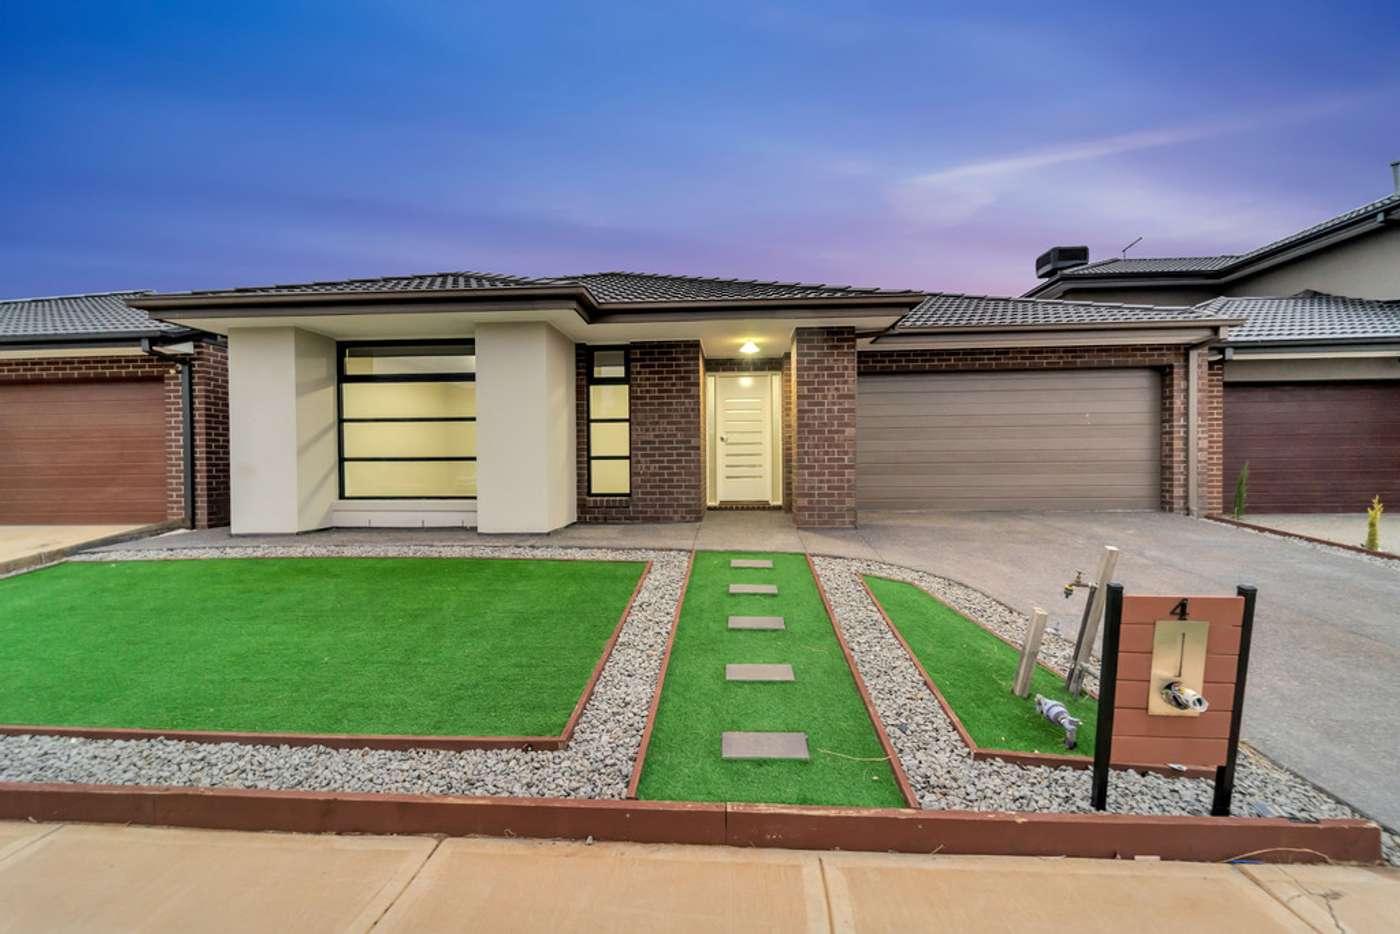 Main view of Homely house listing, 4 Wonderboom Avenue, Tarneit VIC 3029